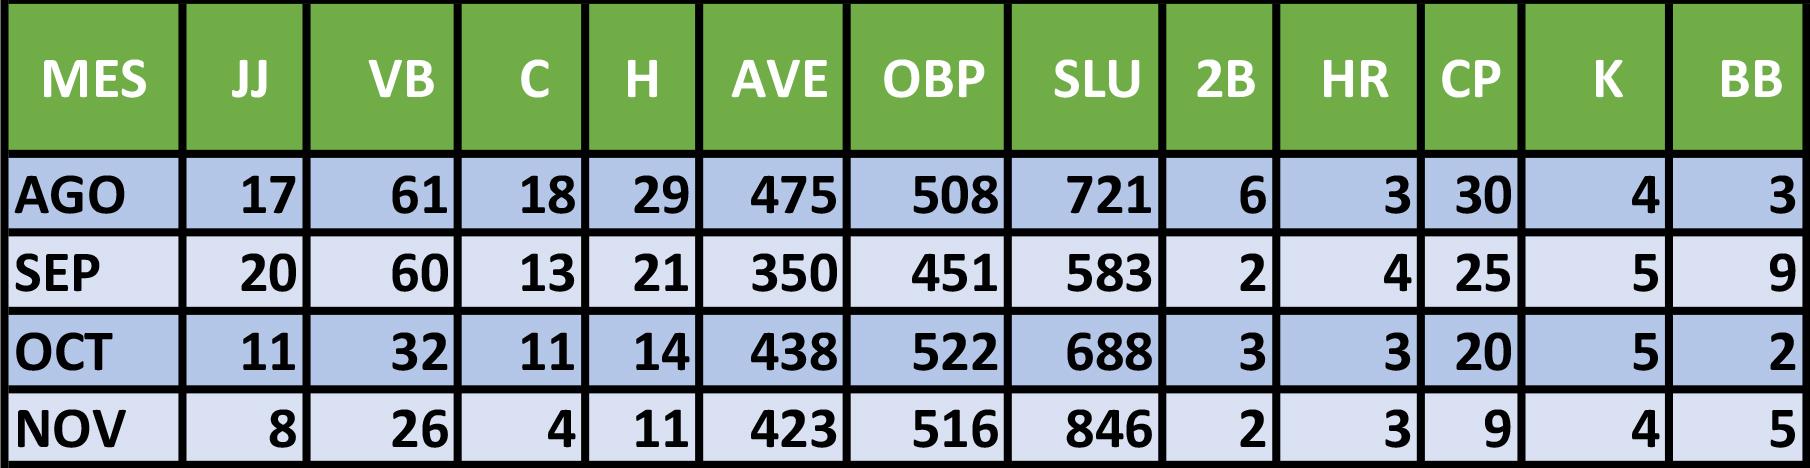 Estadísticas de Jorge Alomá en la presente Serie Nacional de la pelota cubana.